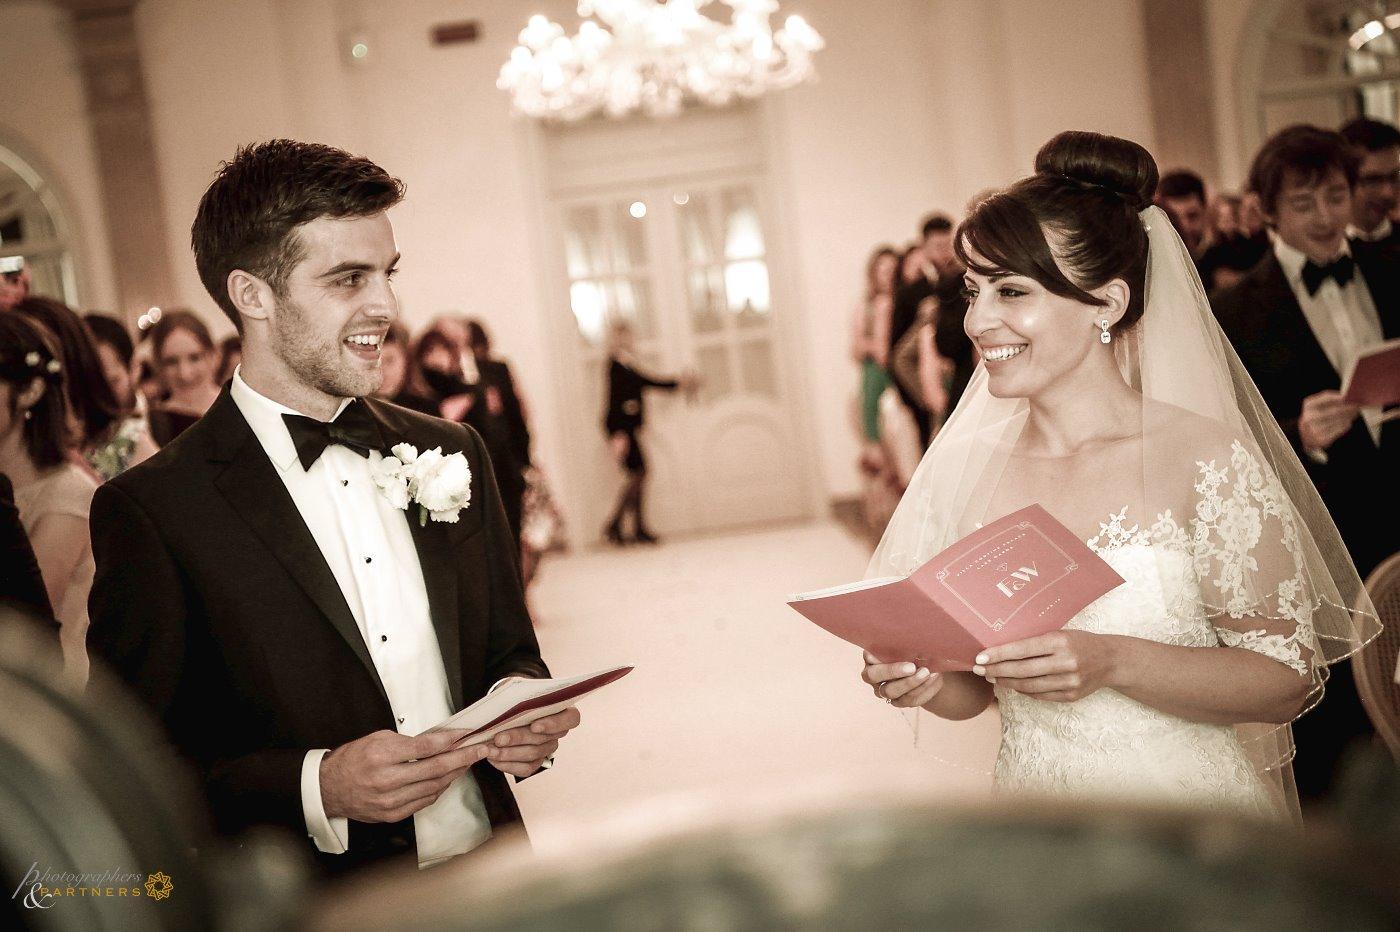 photographer_weddings_sirmione_05.jpg